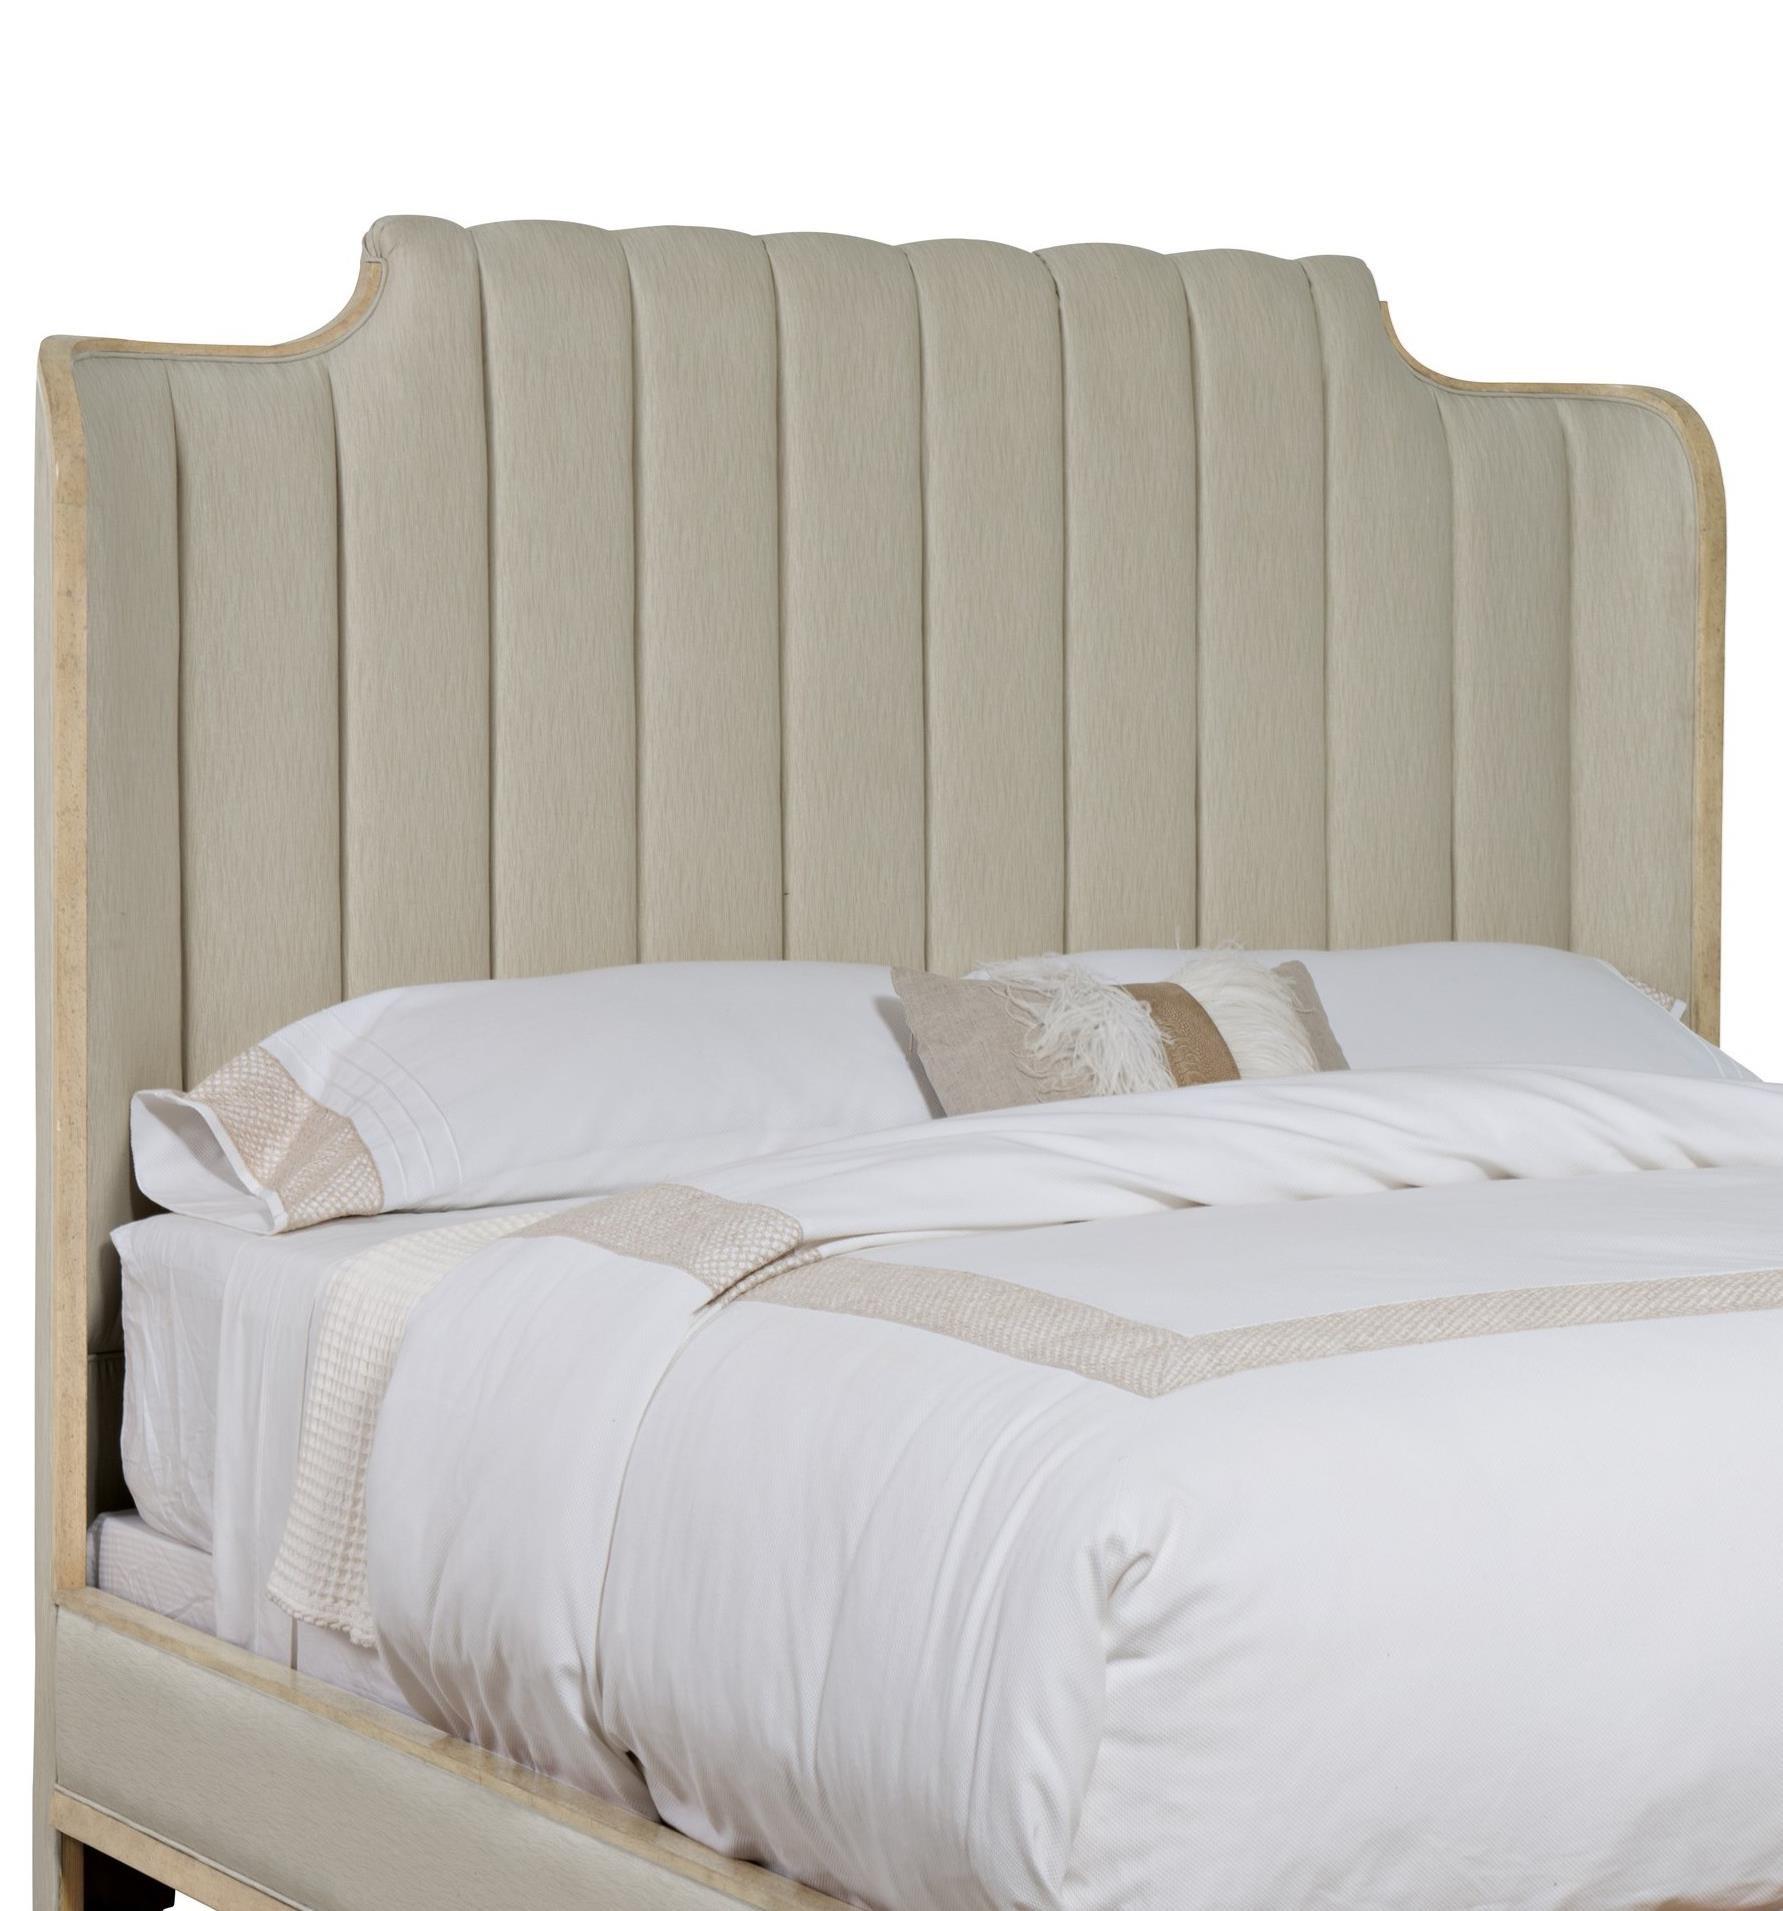 King/California King Upholstered Headboard